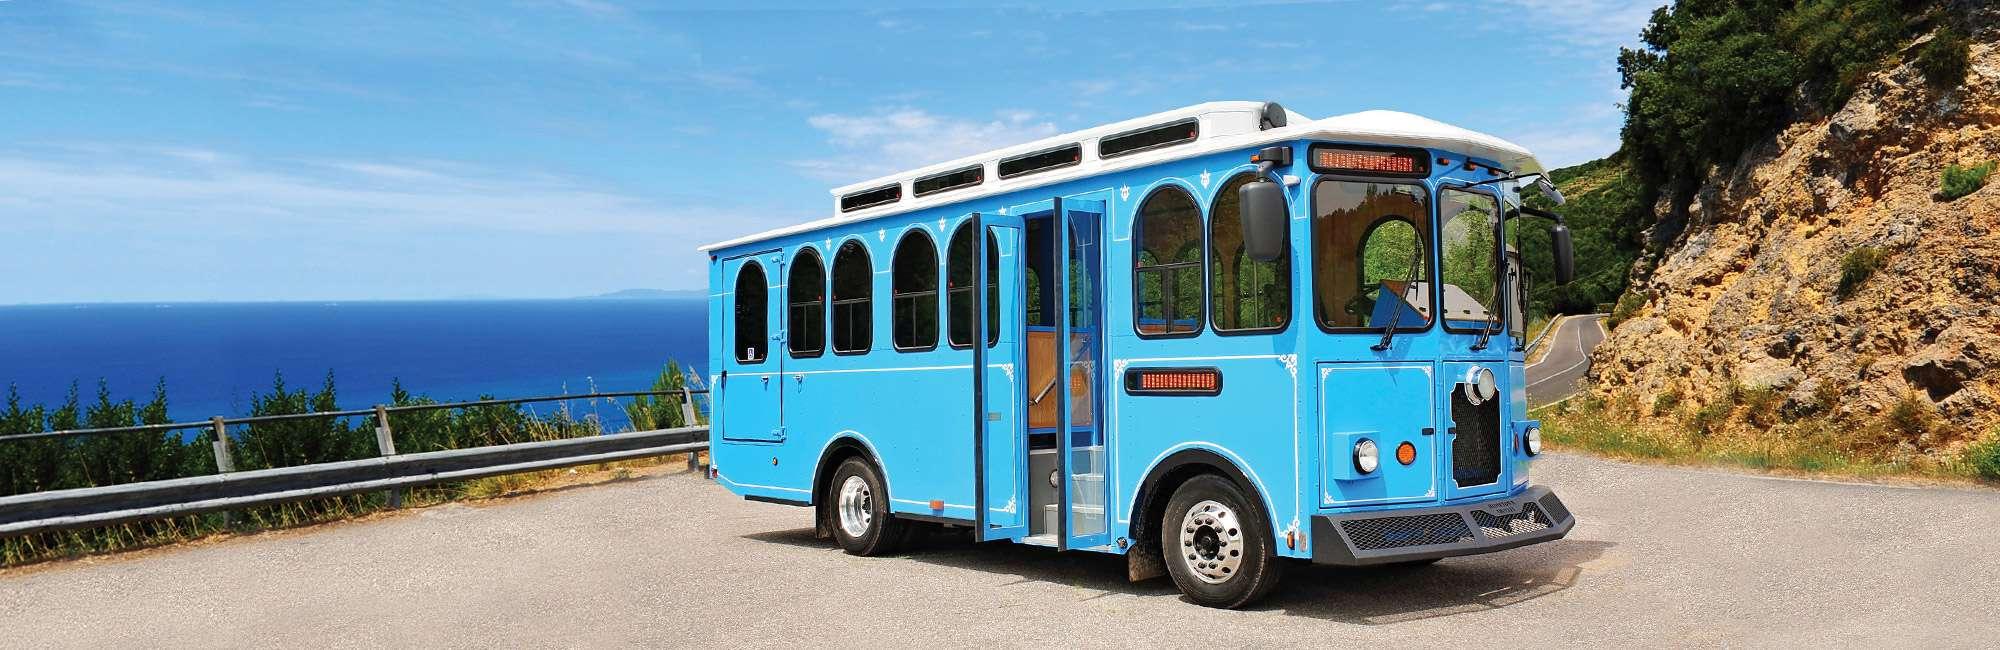 New-buses-Trolley-5_compressed.jpg